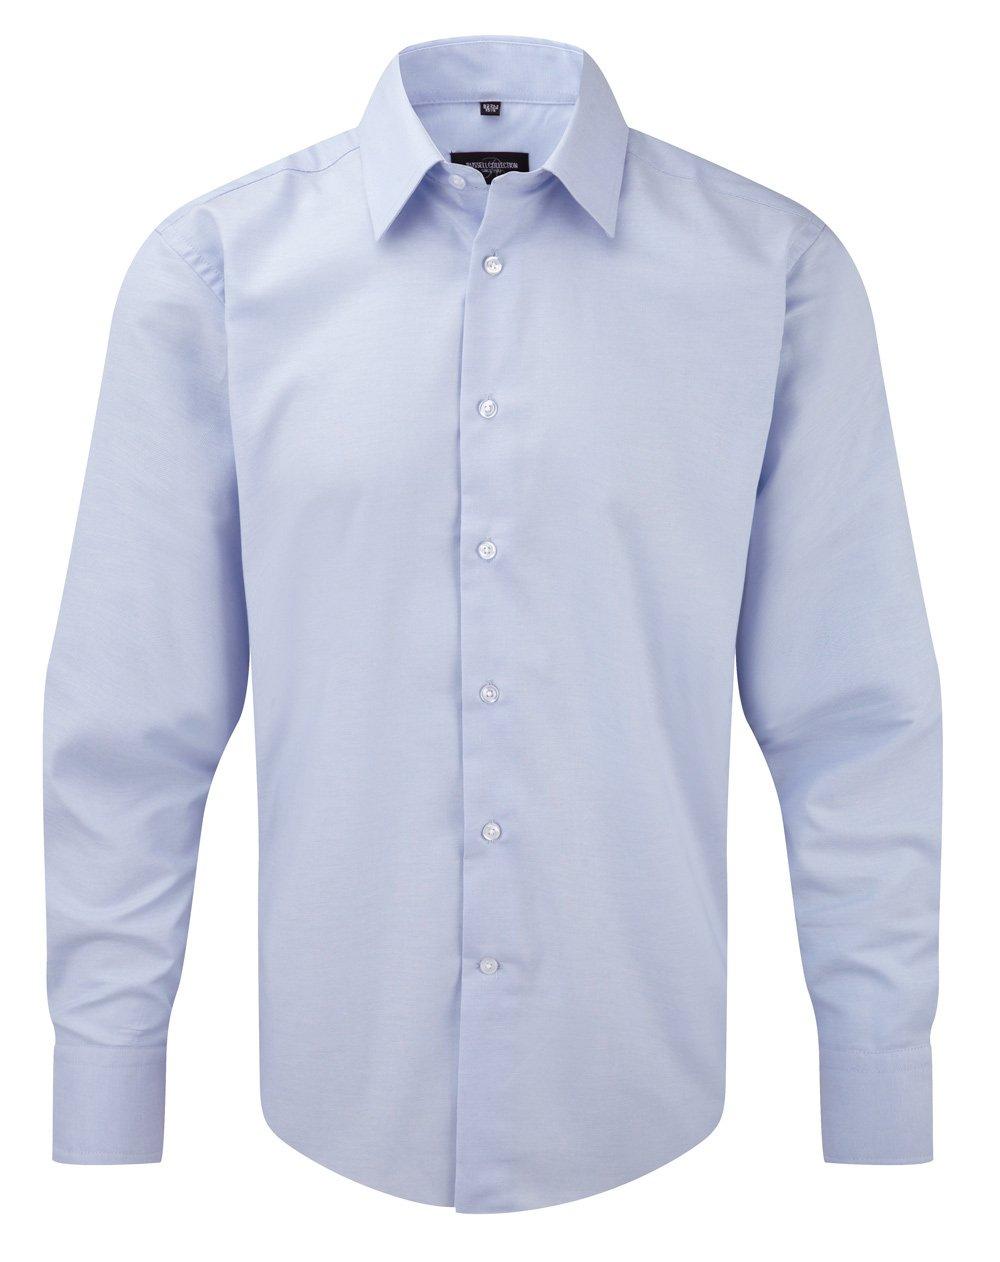 Camicia JE922M con Iniziale Ricamata Y Men's Long Sleeve Tailored Oxford Shirt - Tutte Le Taglie by tshirteria t-shirteria